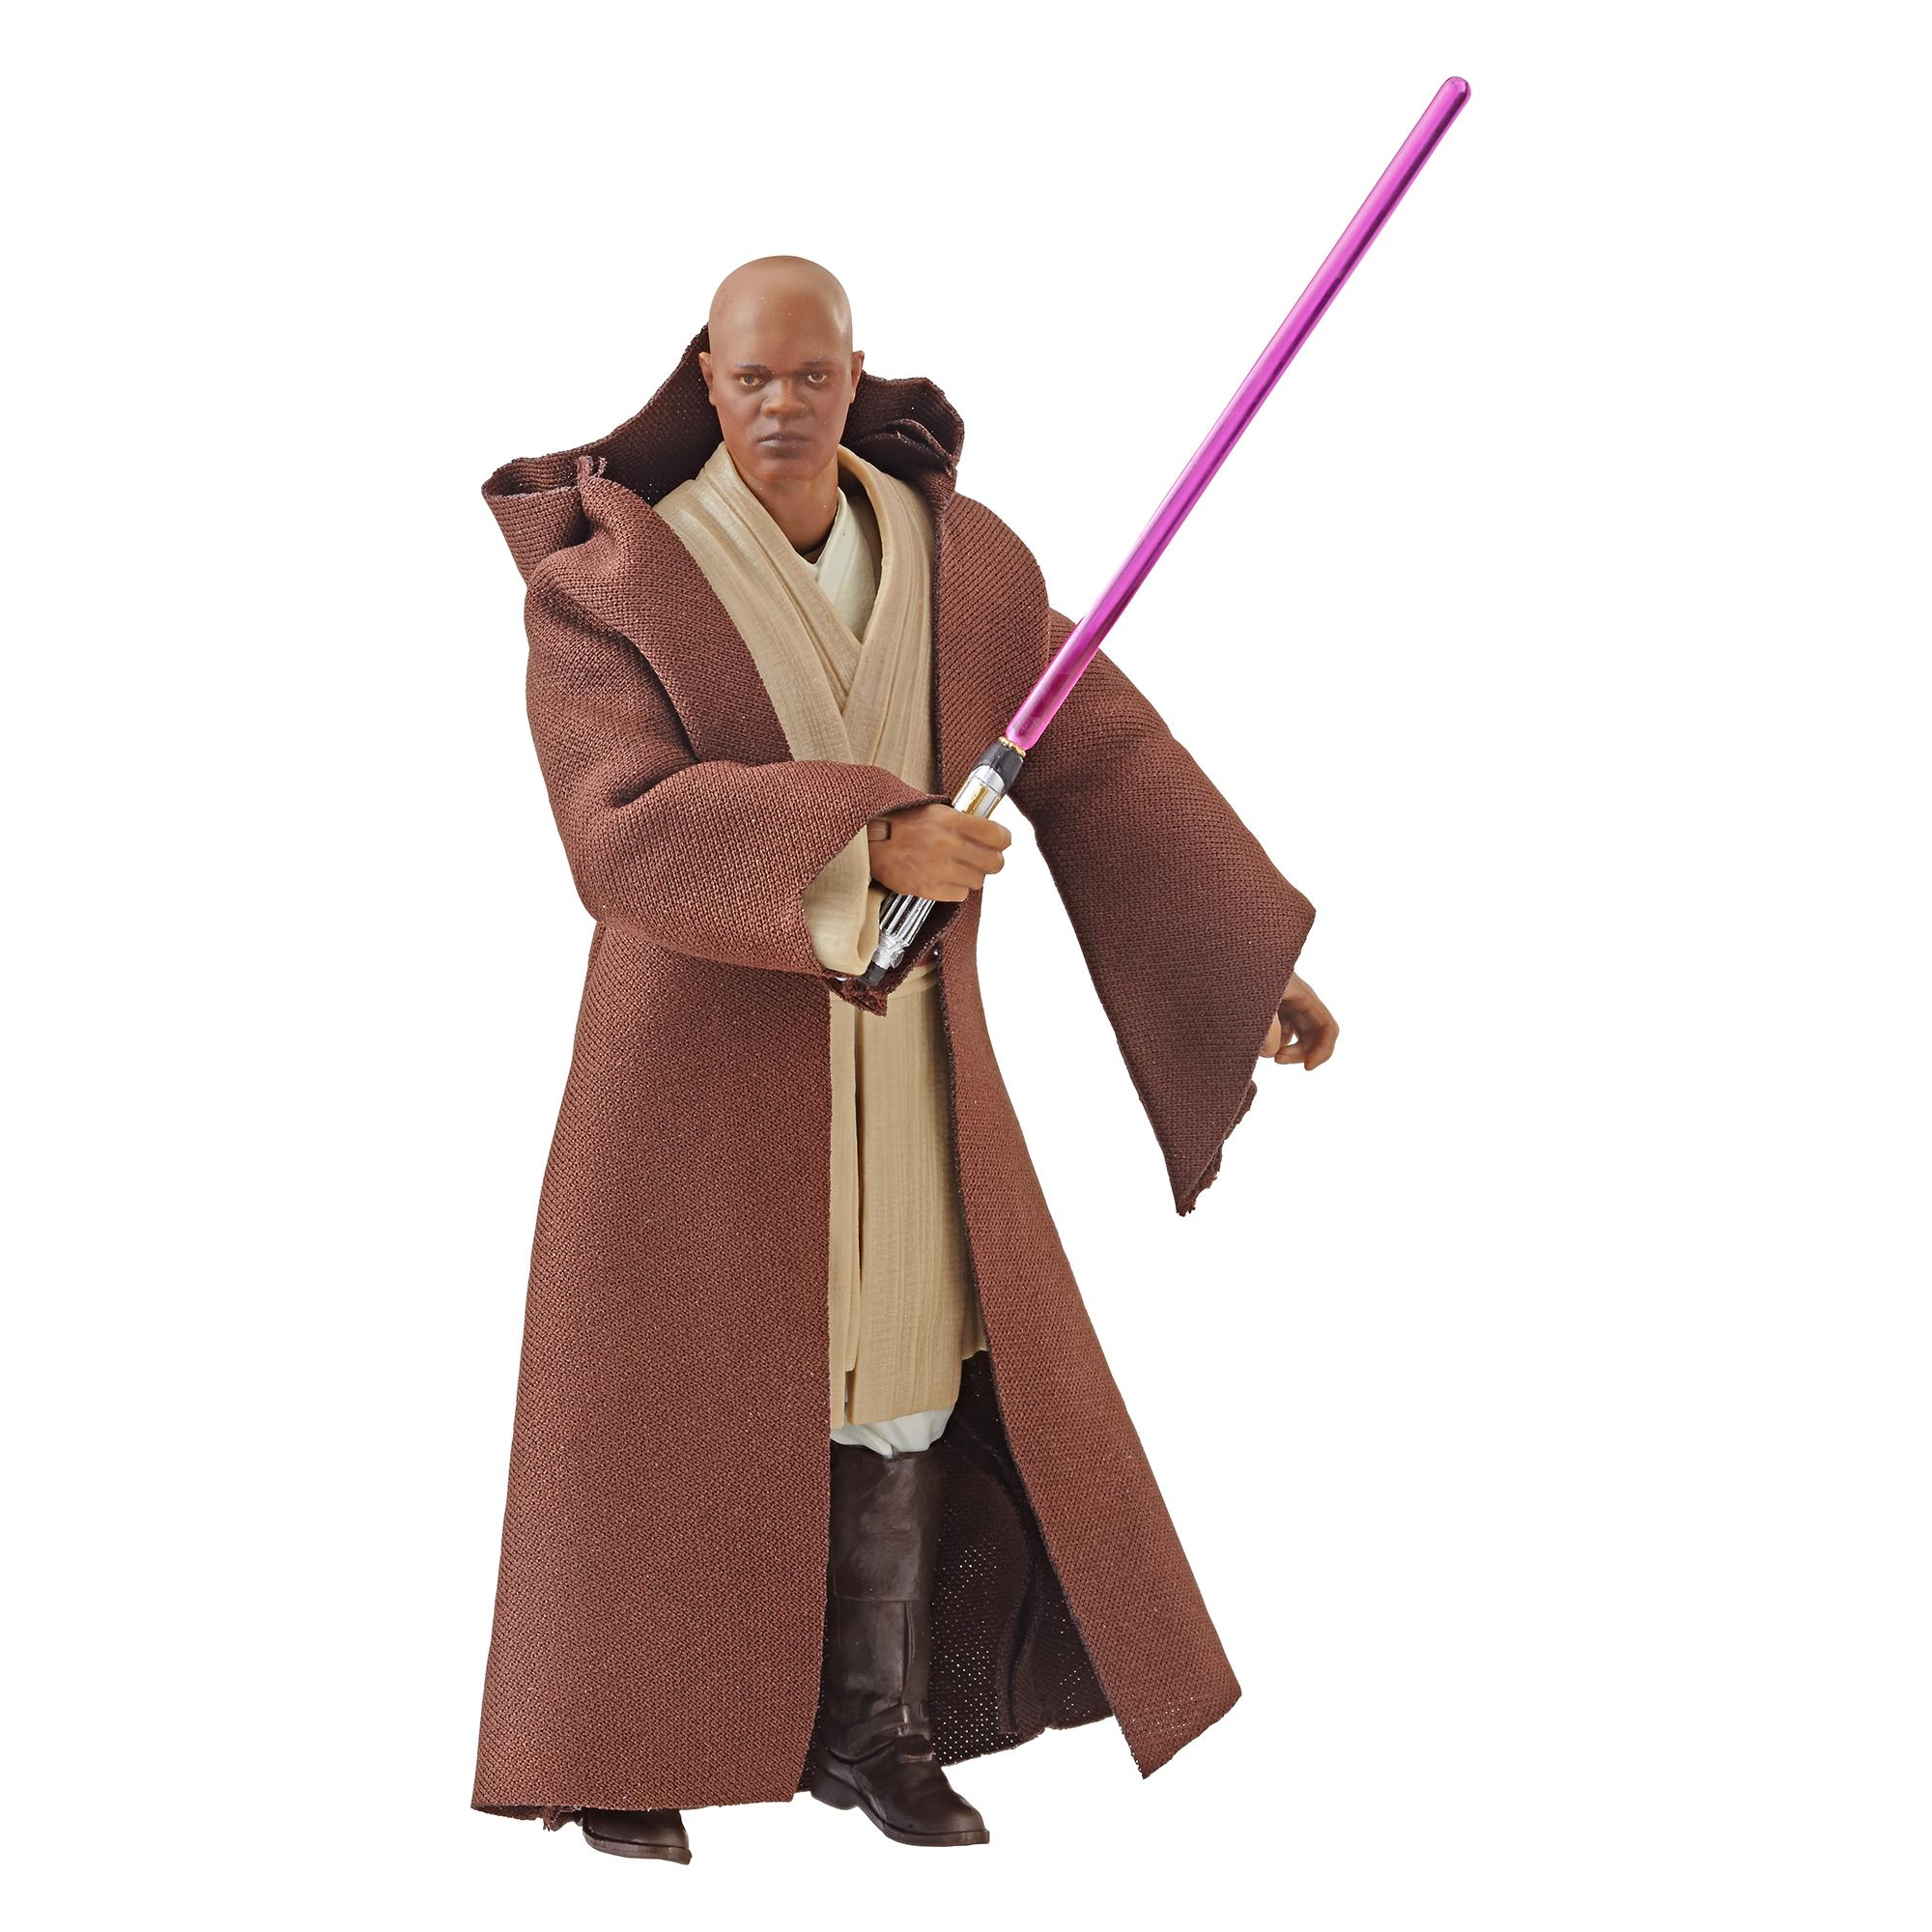 Star Wars The Black Series 6-inch Mace Windu Figure